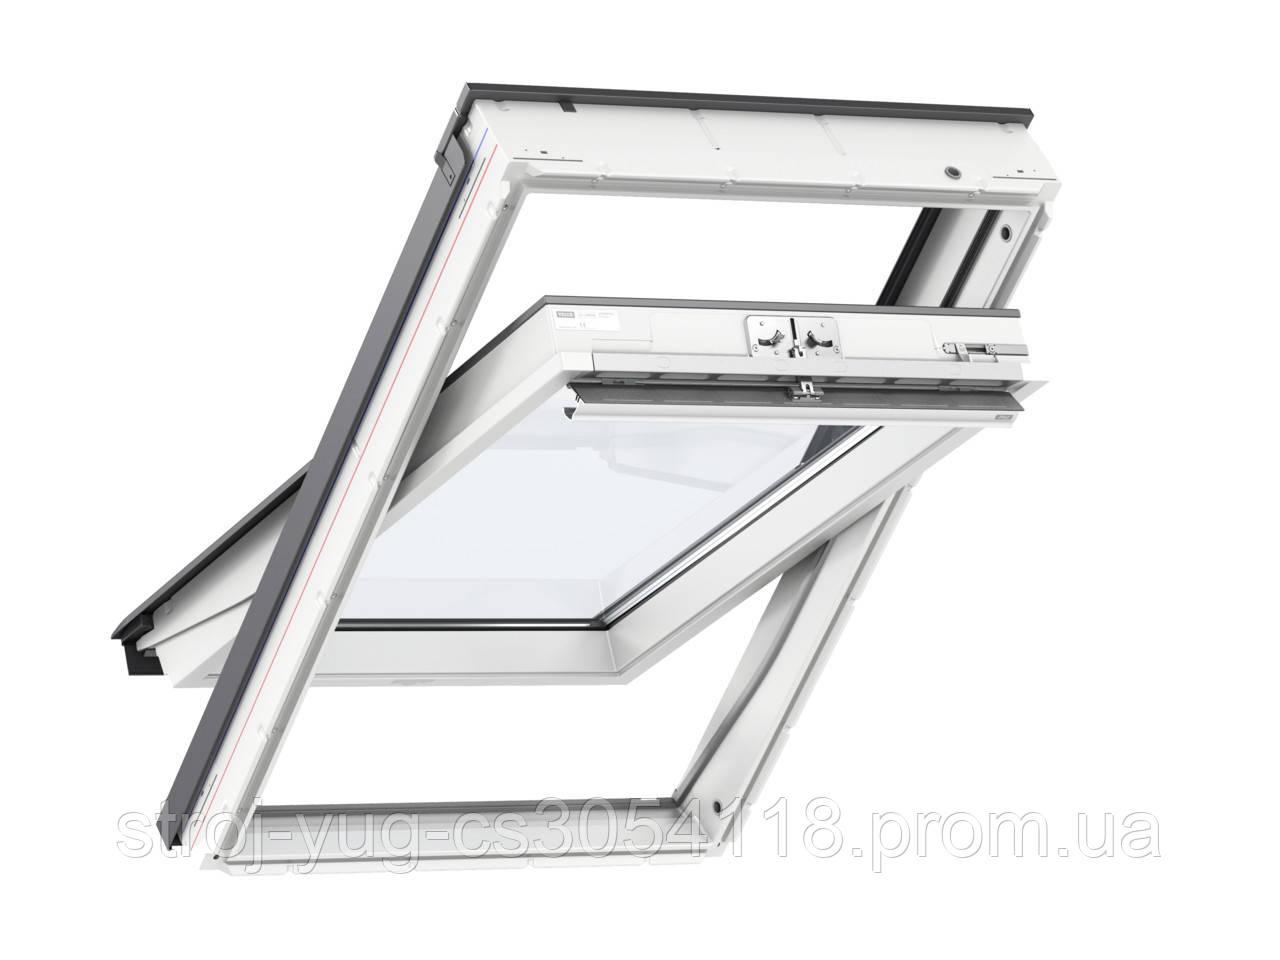 Мансардное влагостойкое окно VELUX Стандарт GLU 0051, ручка сверху, дерево/полиуретан, 78х140